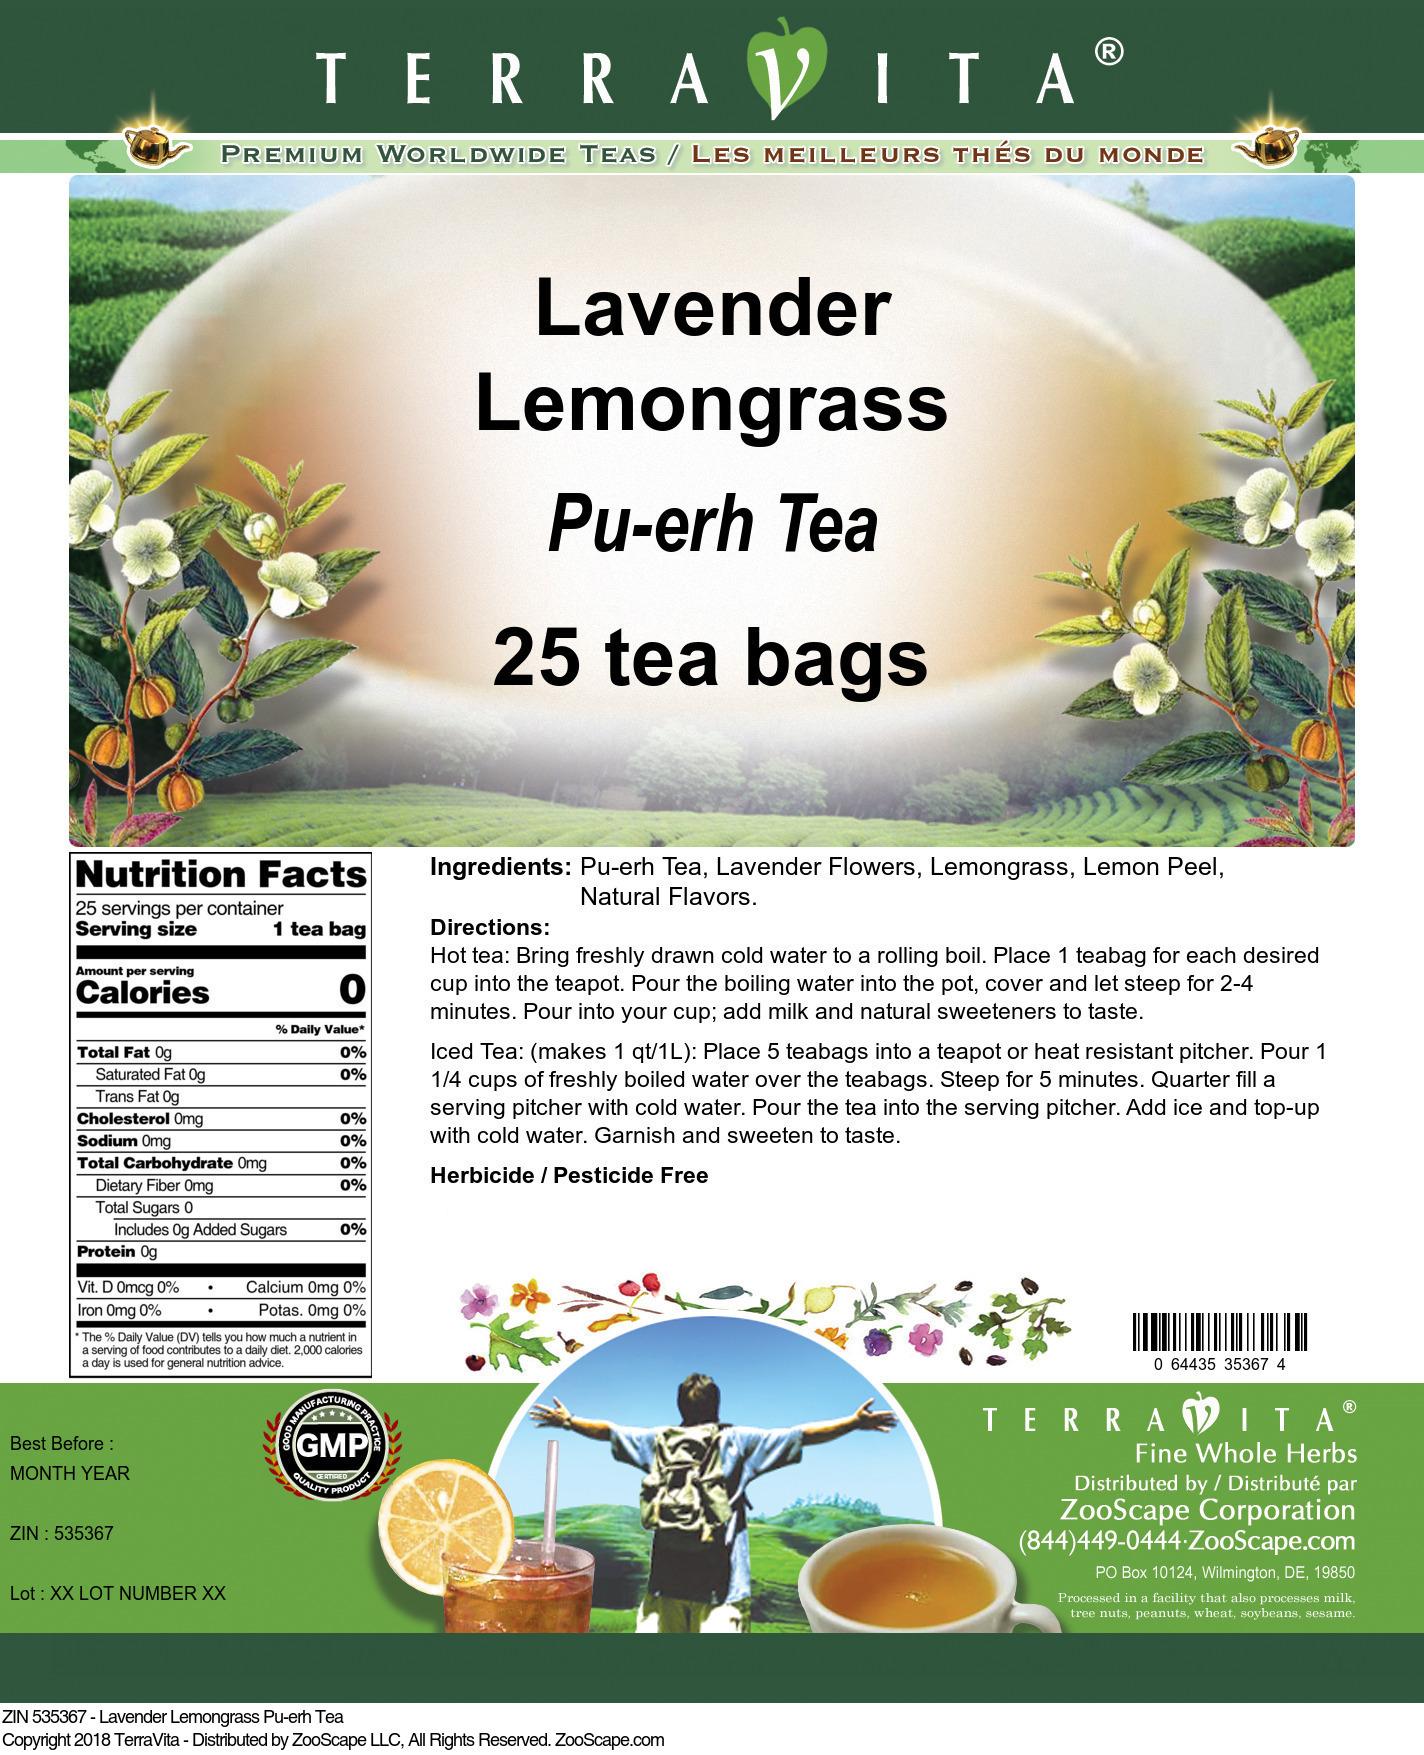 Lavender Lemongrass Pu-erh Tea